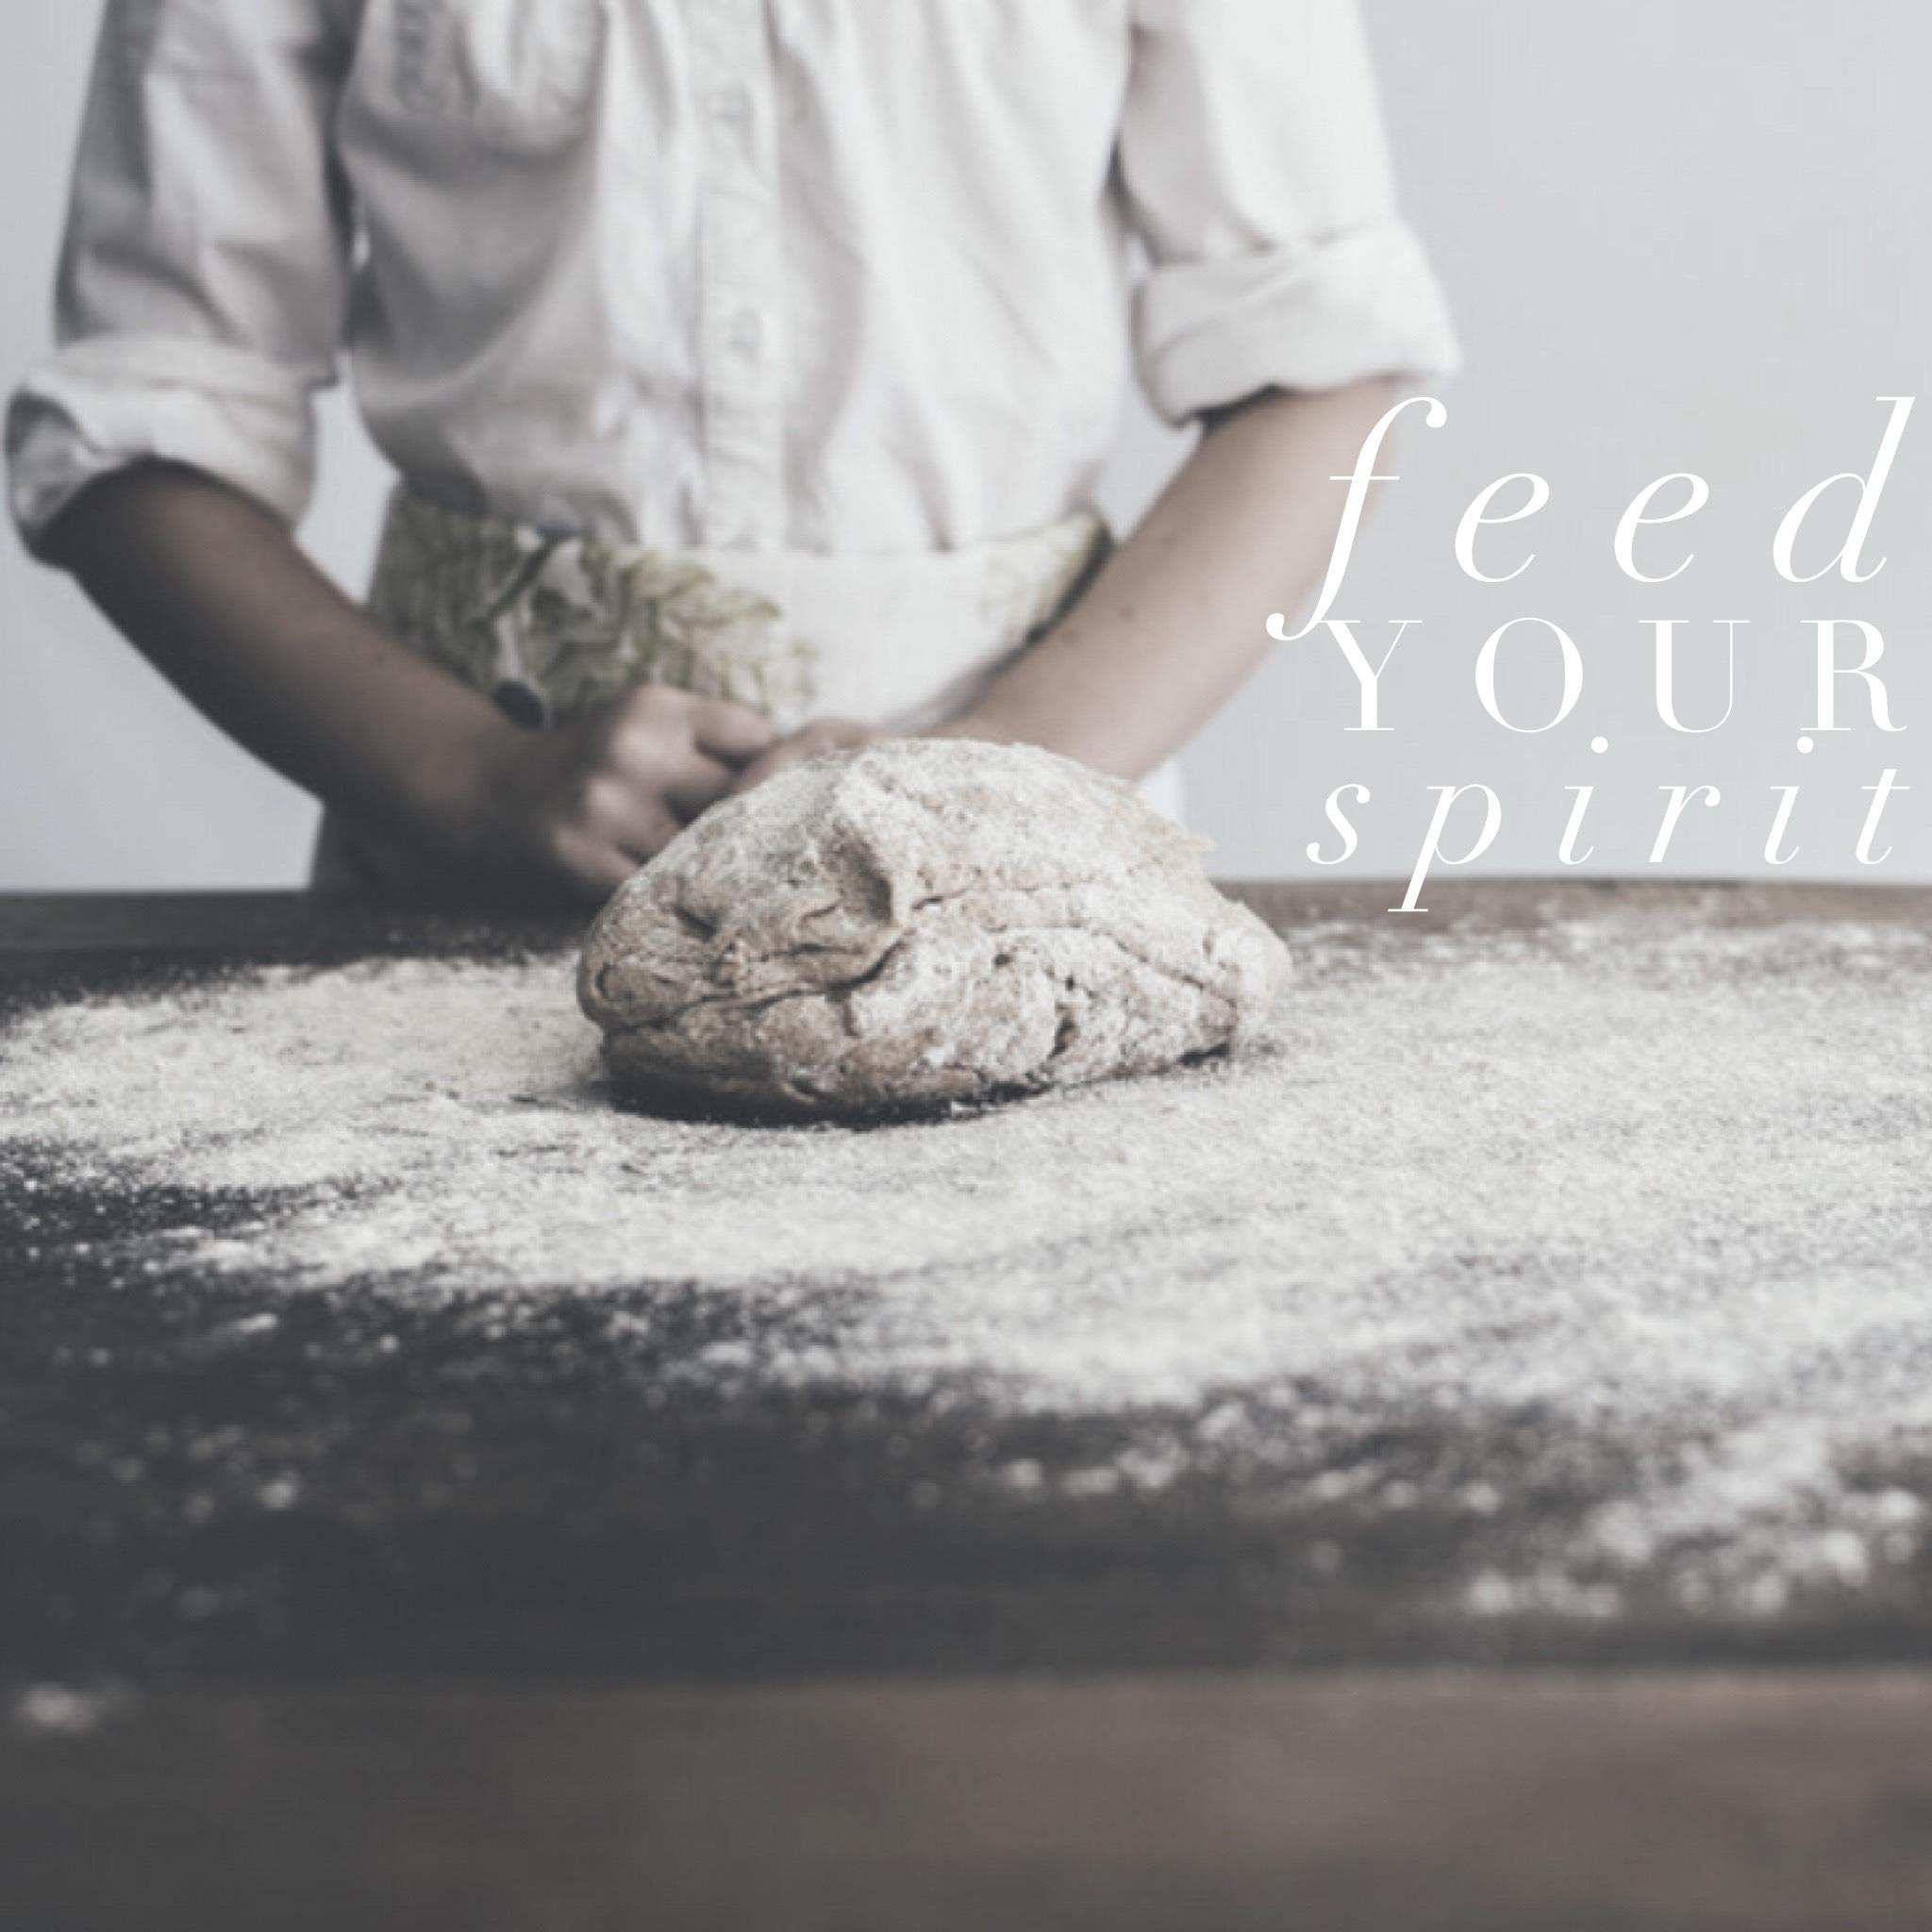 feed-your-spirit.jpg